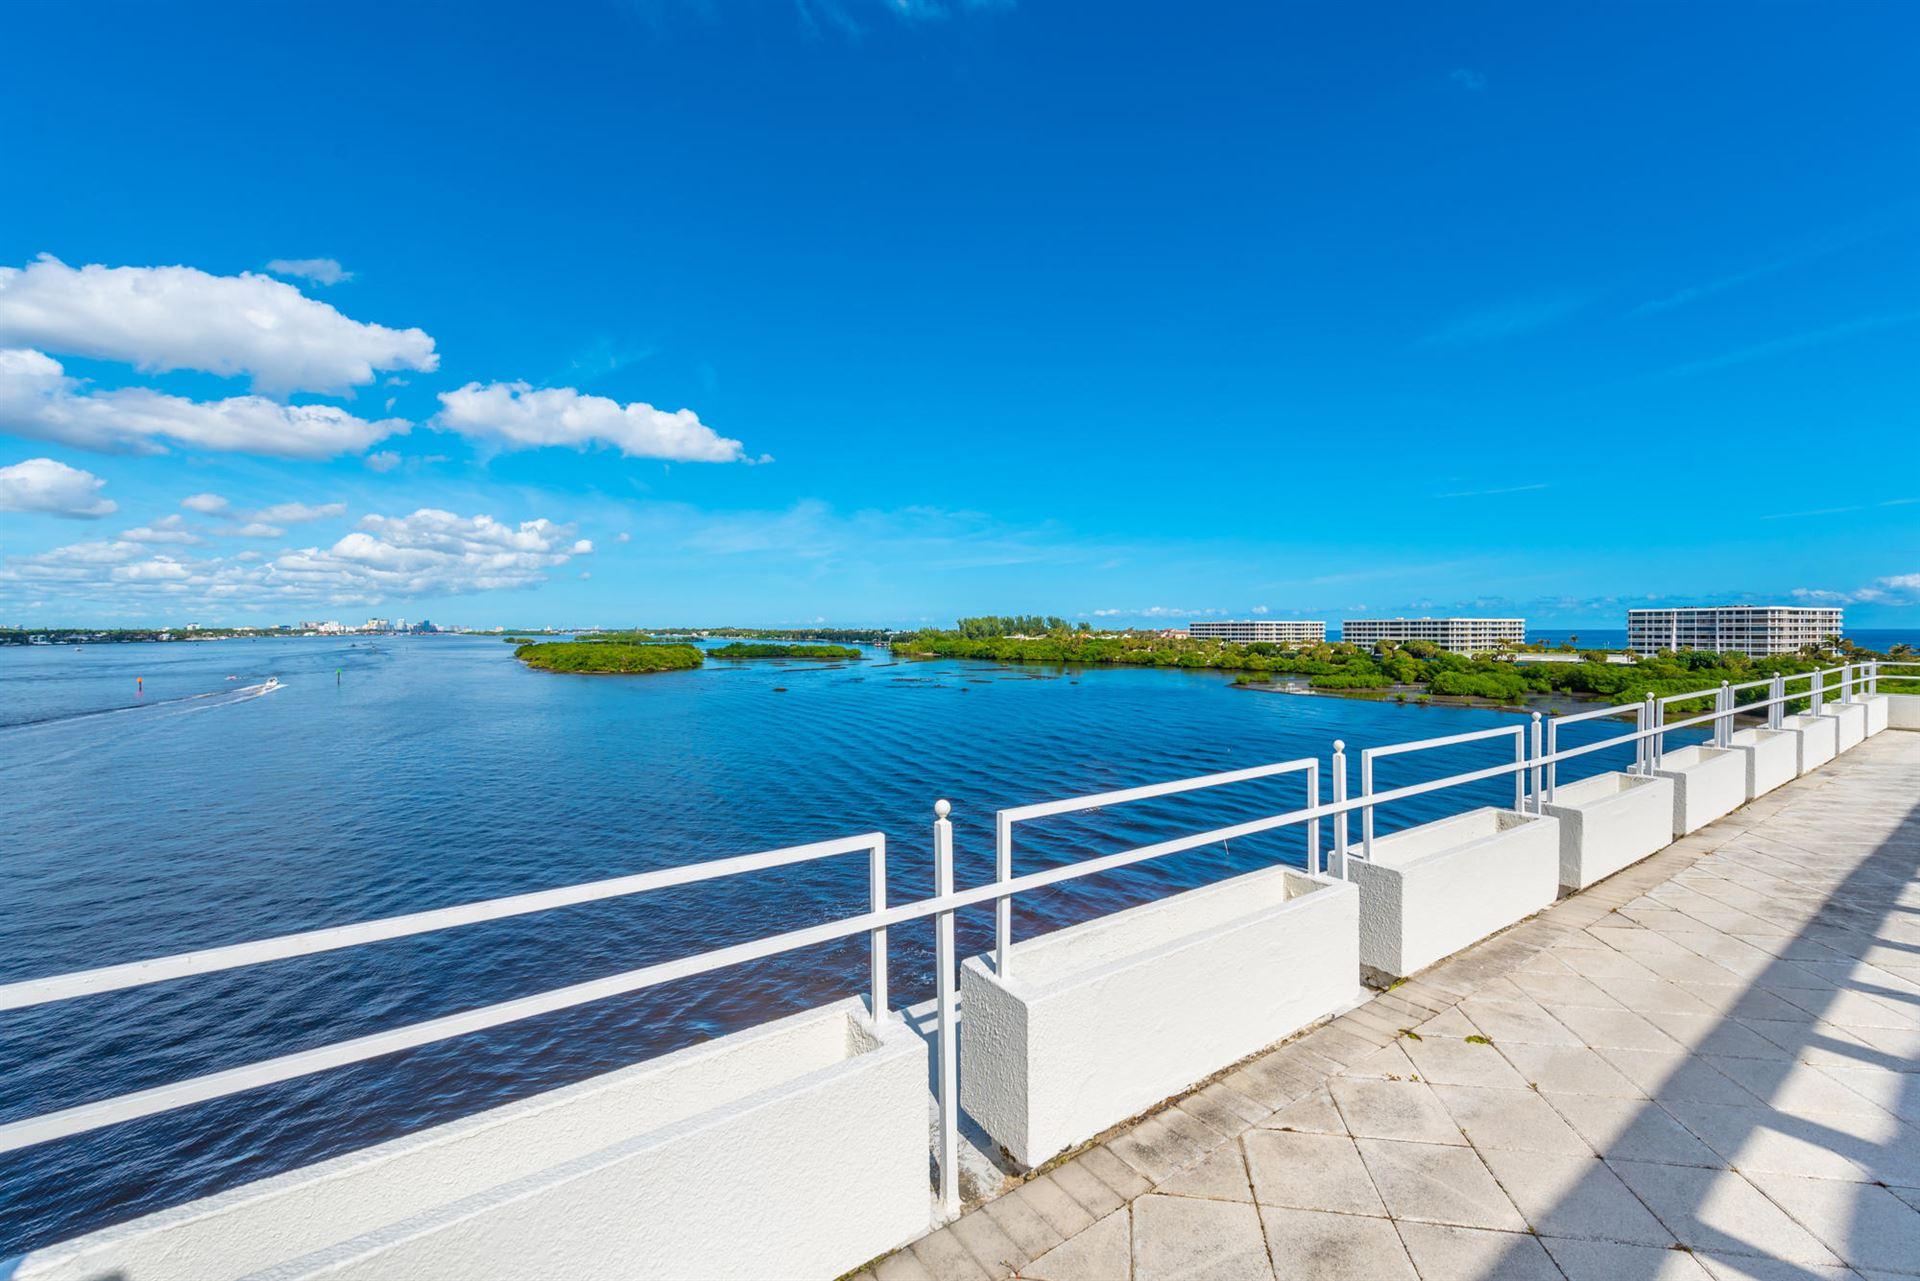 Photo of 2150 Ibis Isle Road #Phe 5, Palm Beach, FL 33480 (MLS # RX-10674862)